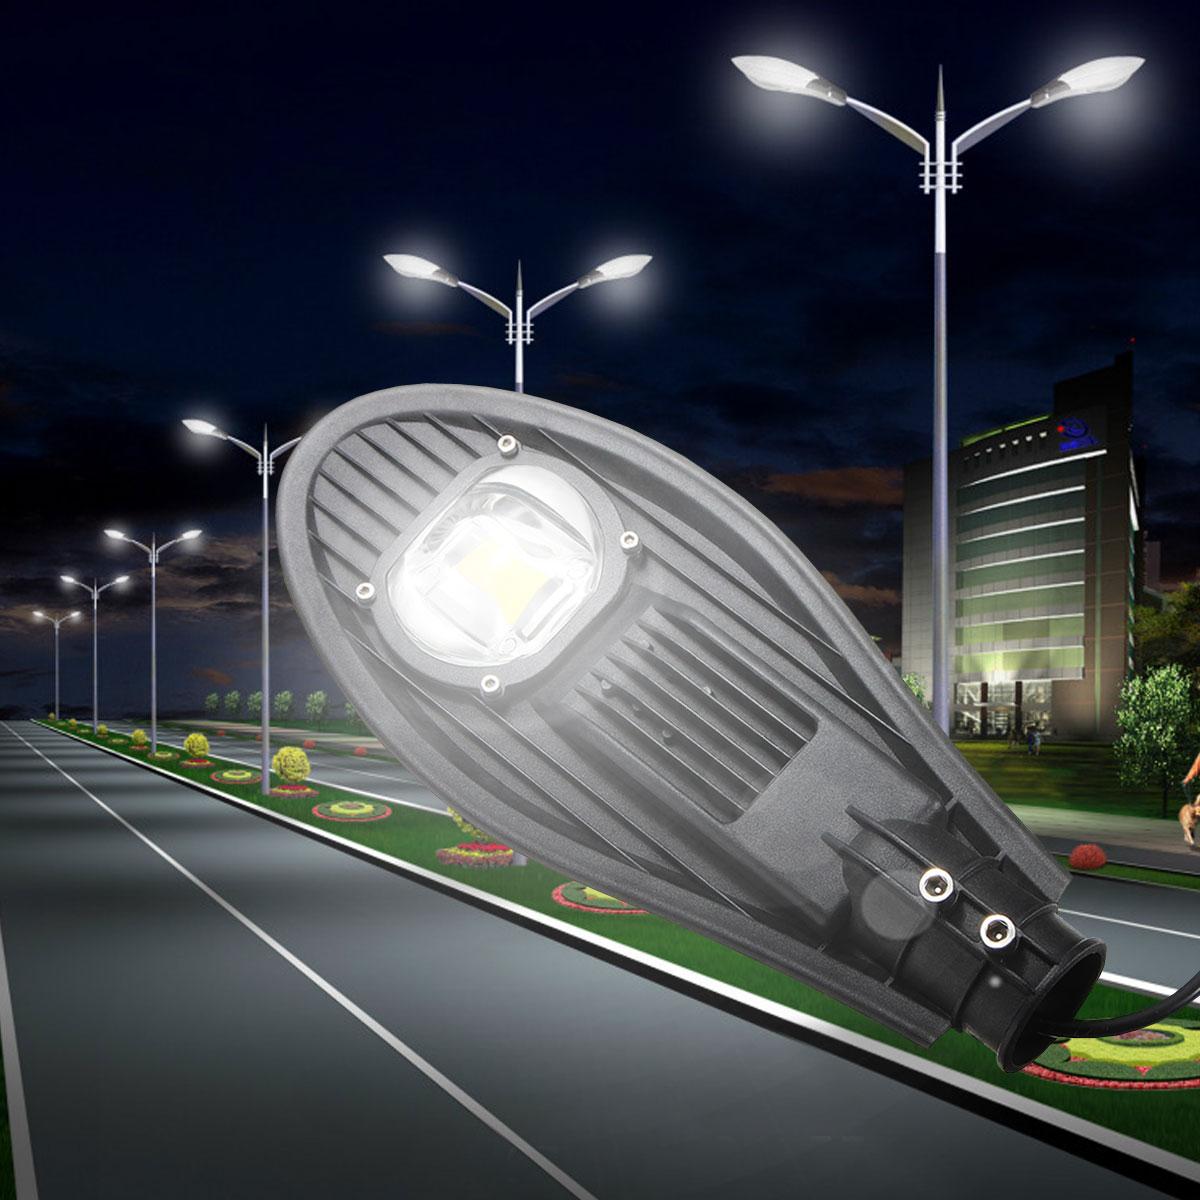 Mising 30W Led Street Light Waterproof IP65 AC85-265V Led Streetlight Road Garden Lamp Warm/Cold White Spotlights Wall Lamp